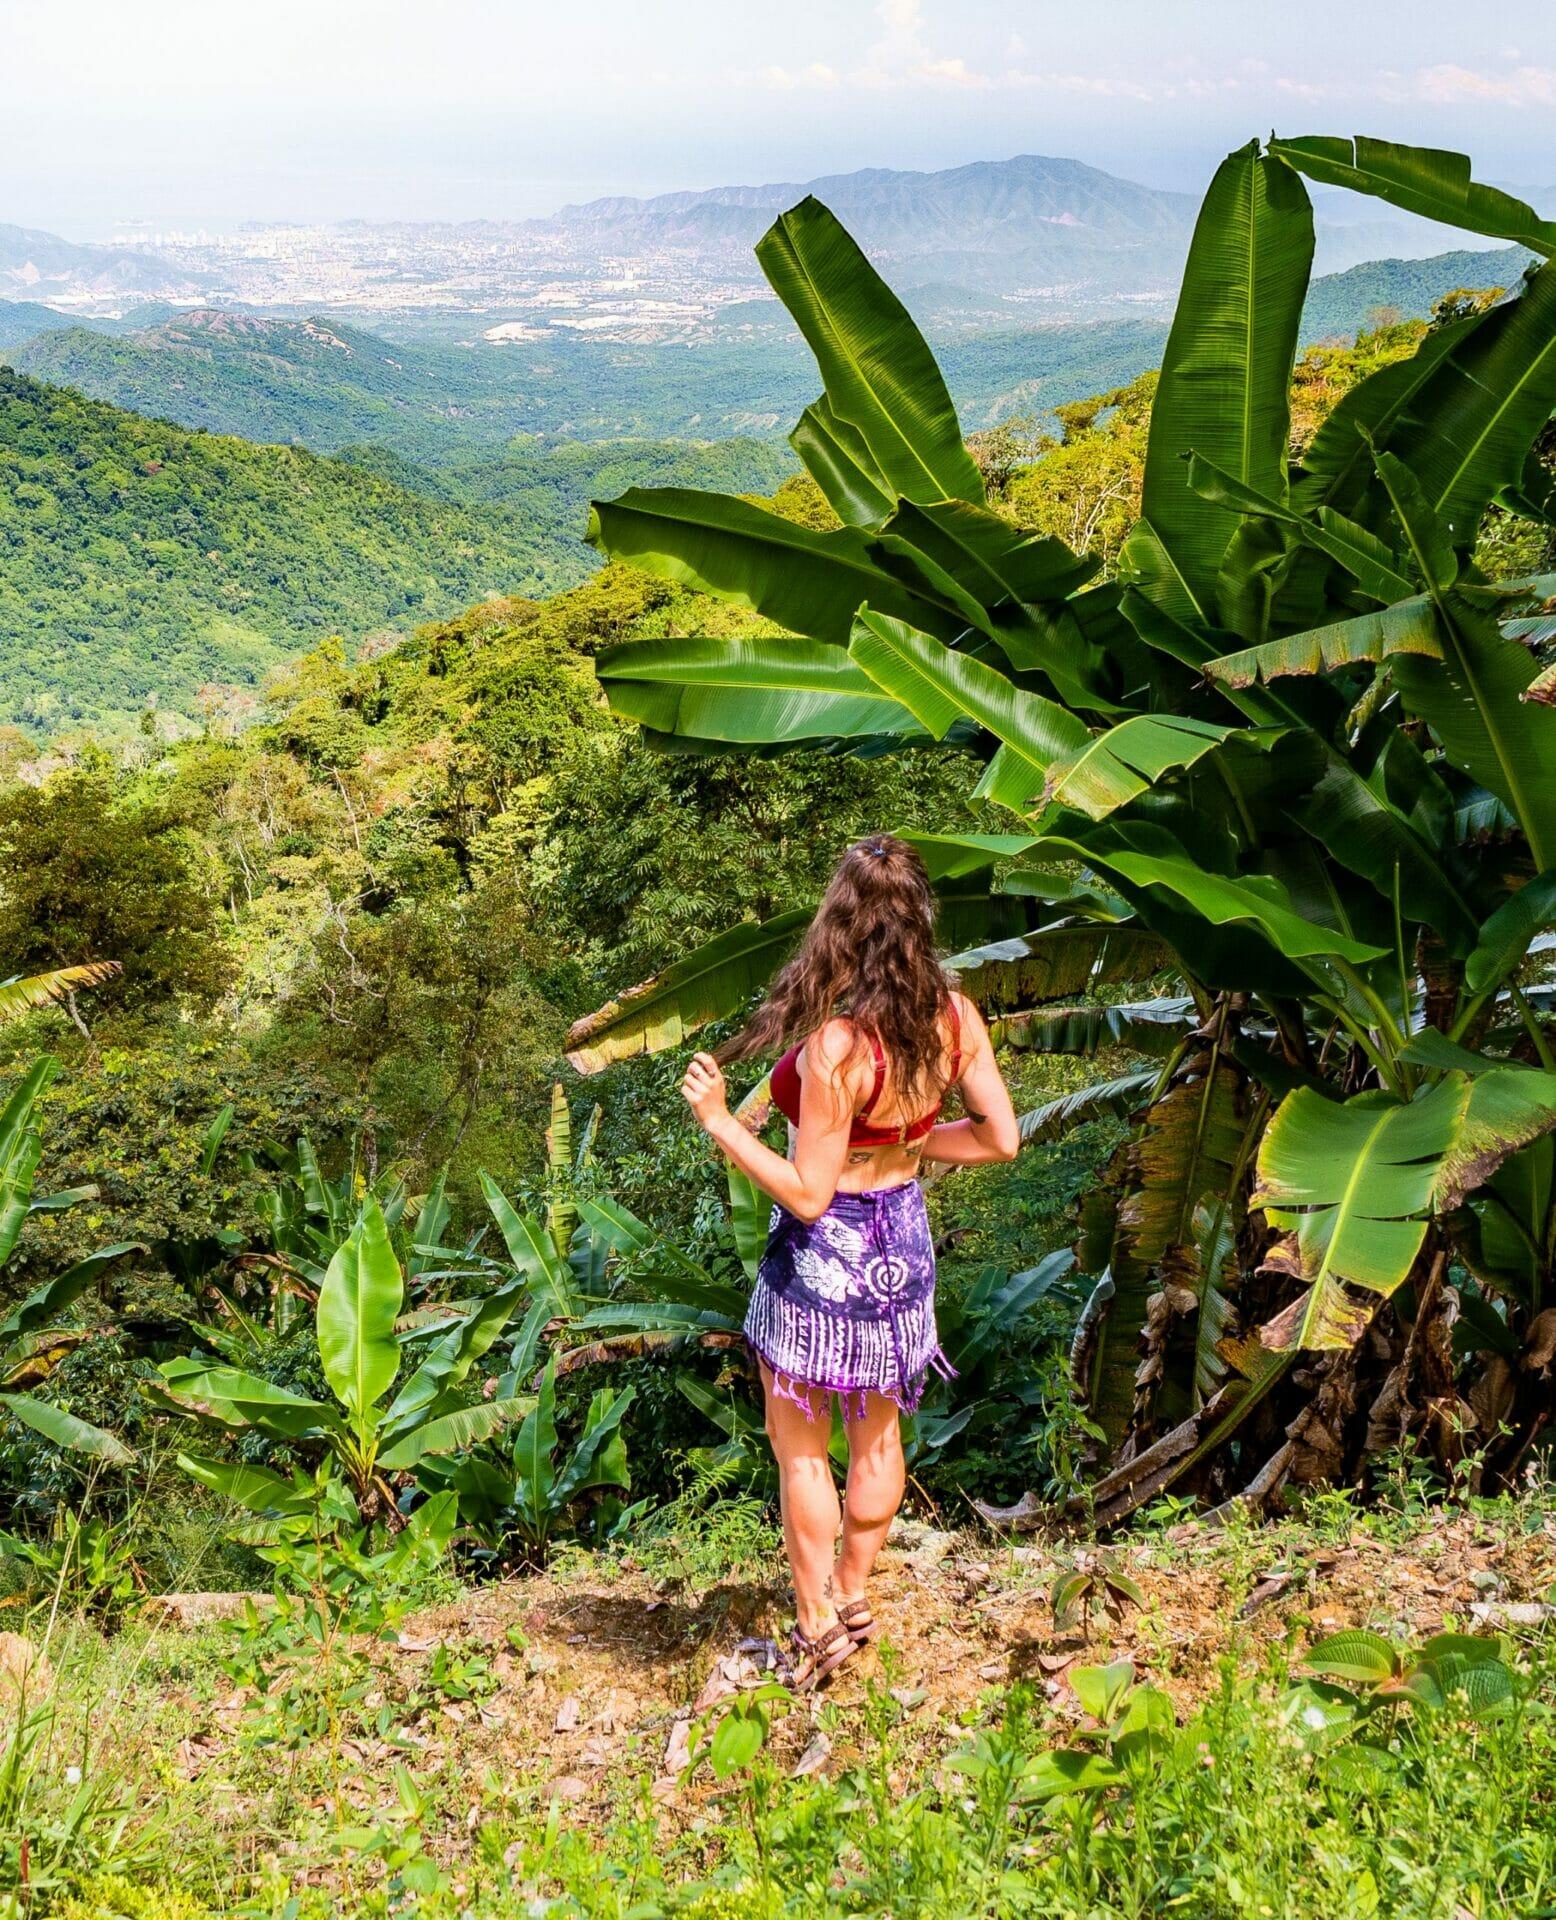 Girl bikini viewpoint Los Pinos Minca Colombia